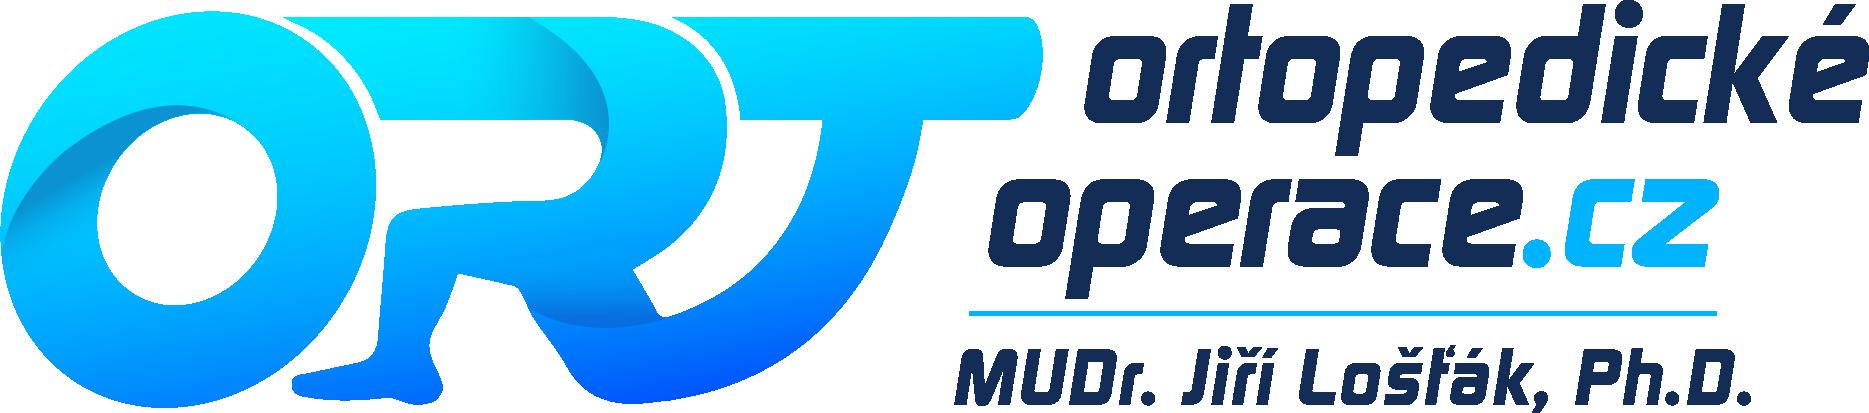 ortopedickeoperace.cz